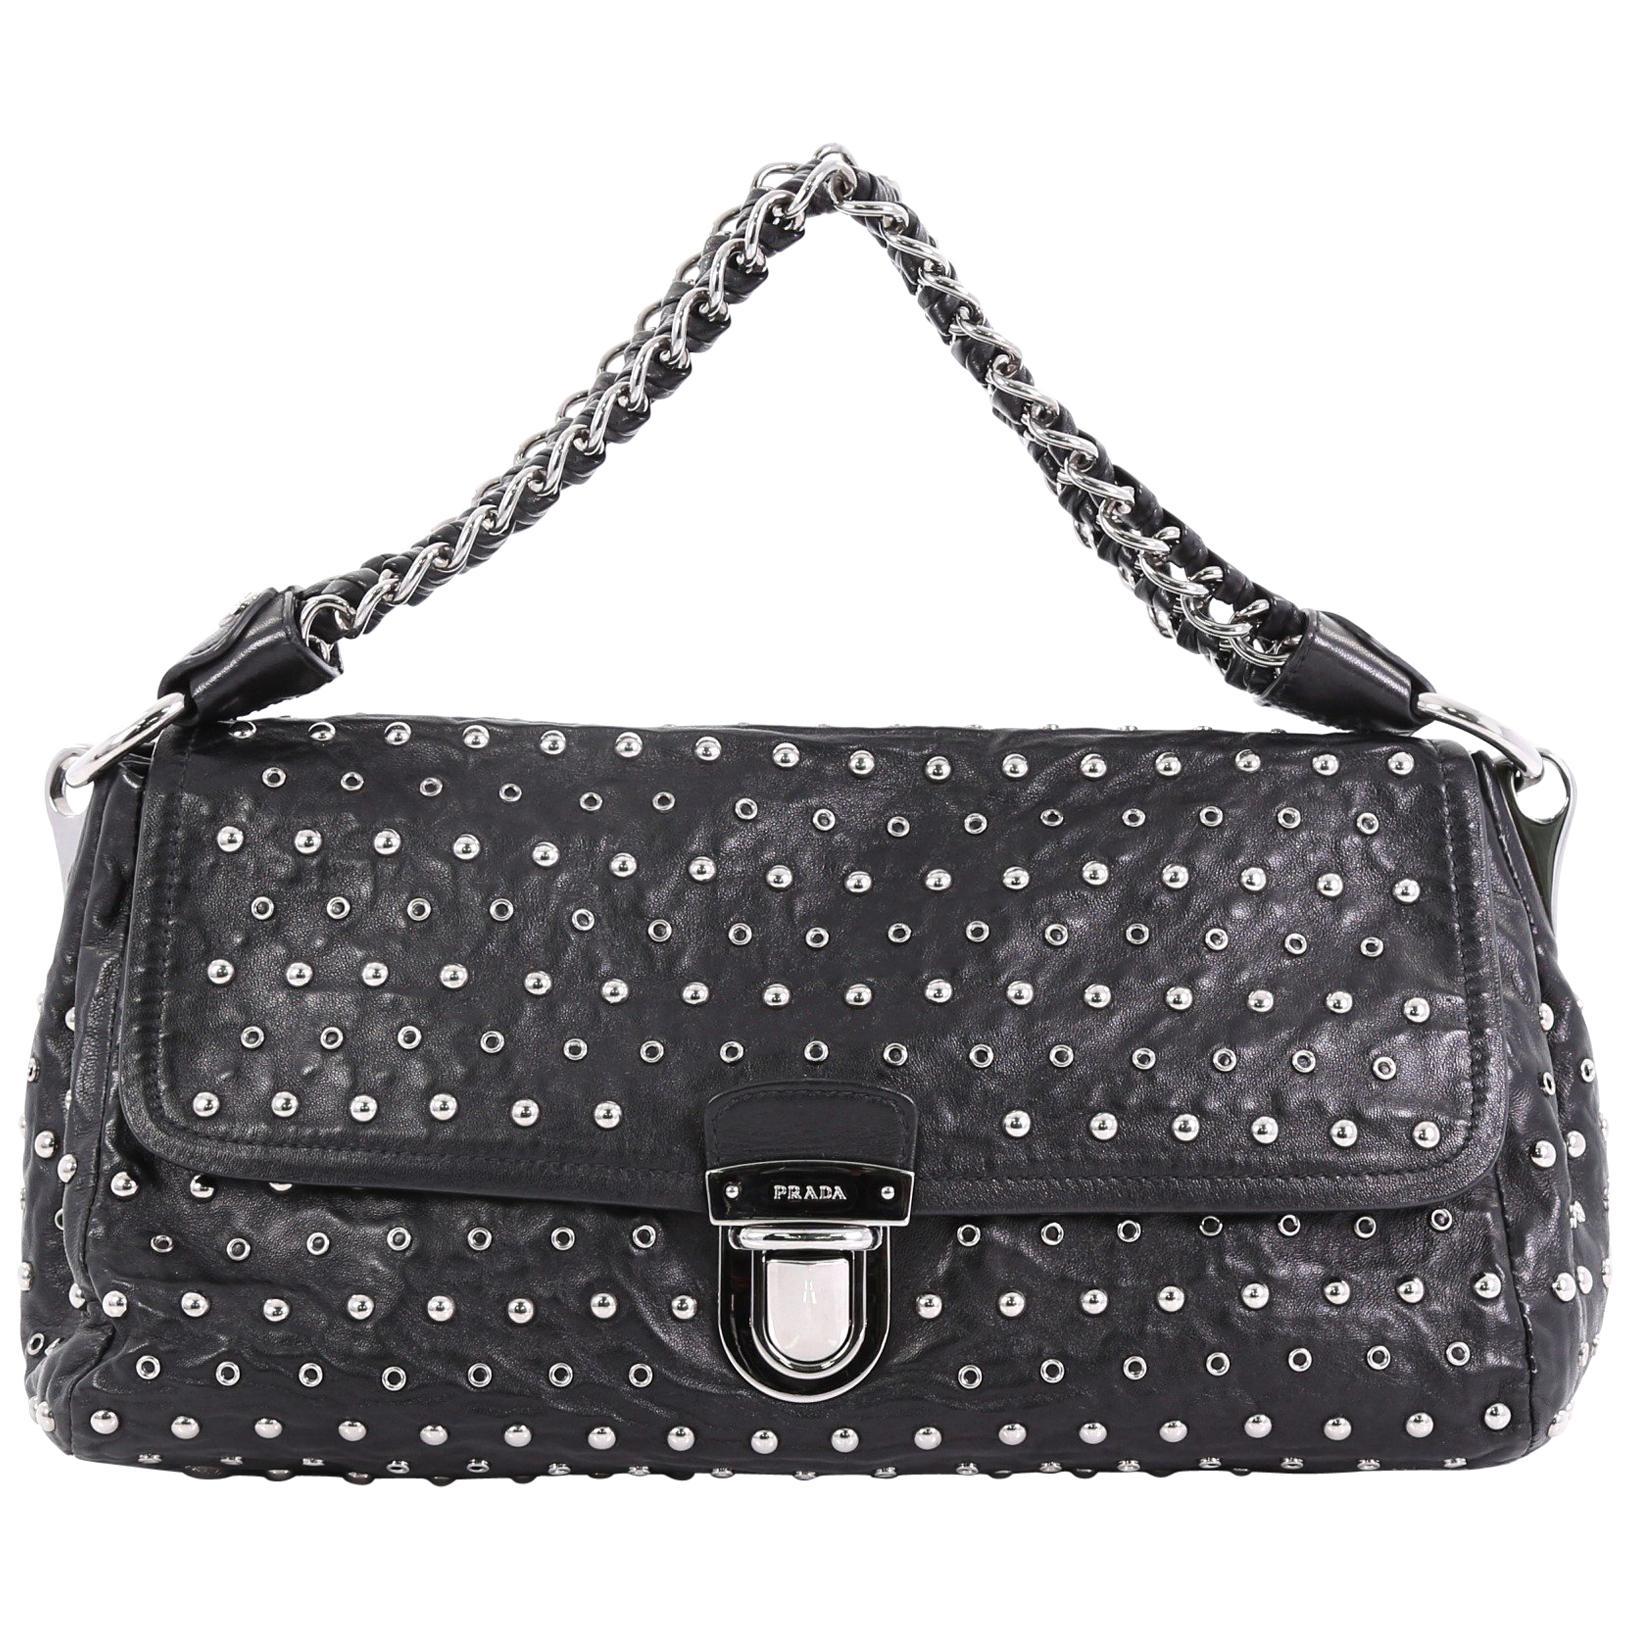 79d1532ec5d3e4 Prada Madras Frame Bag Woven Leather Mini at 1stdibs